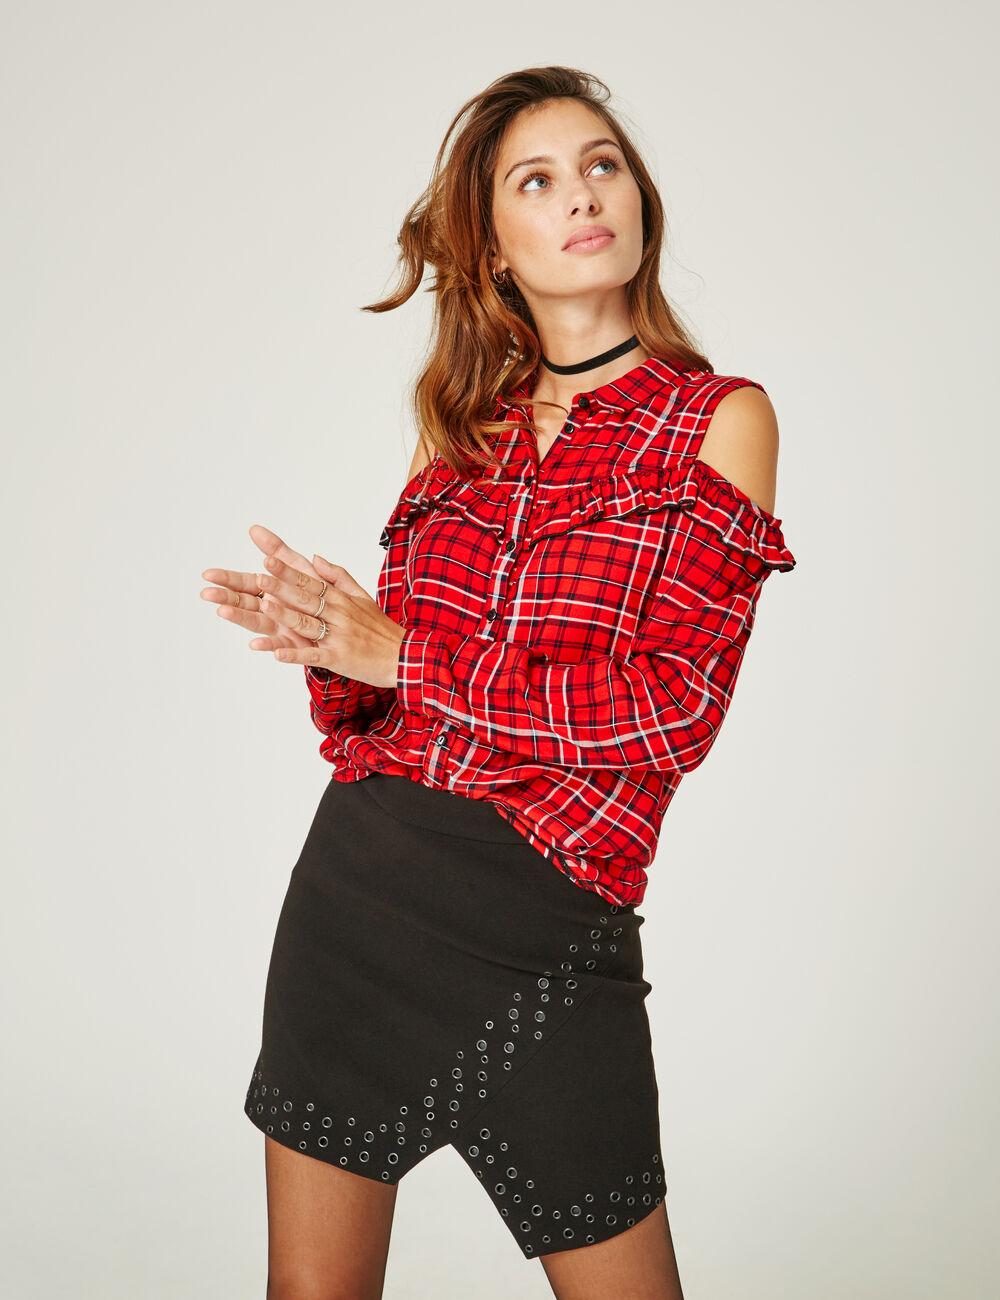 chemise paules ajour es rouge et noire femme jennyfer. Black Bedroom Furniture Sets. Home Design Ideas